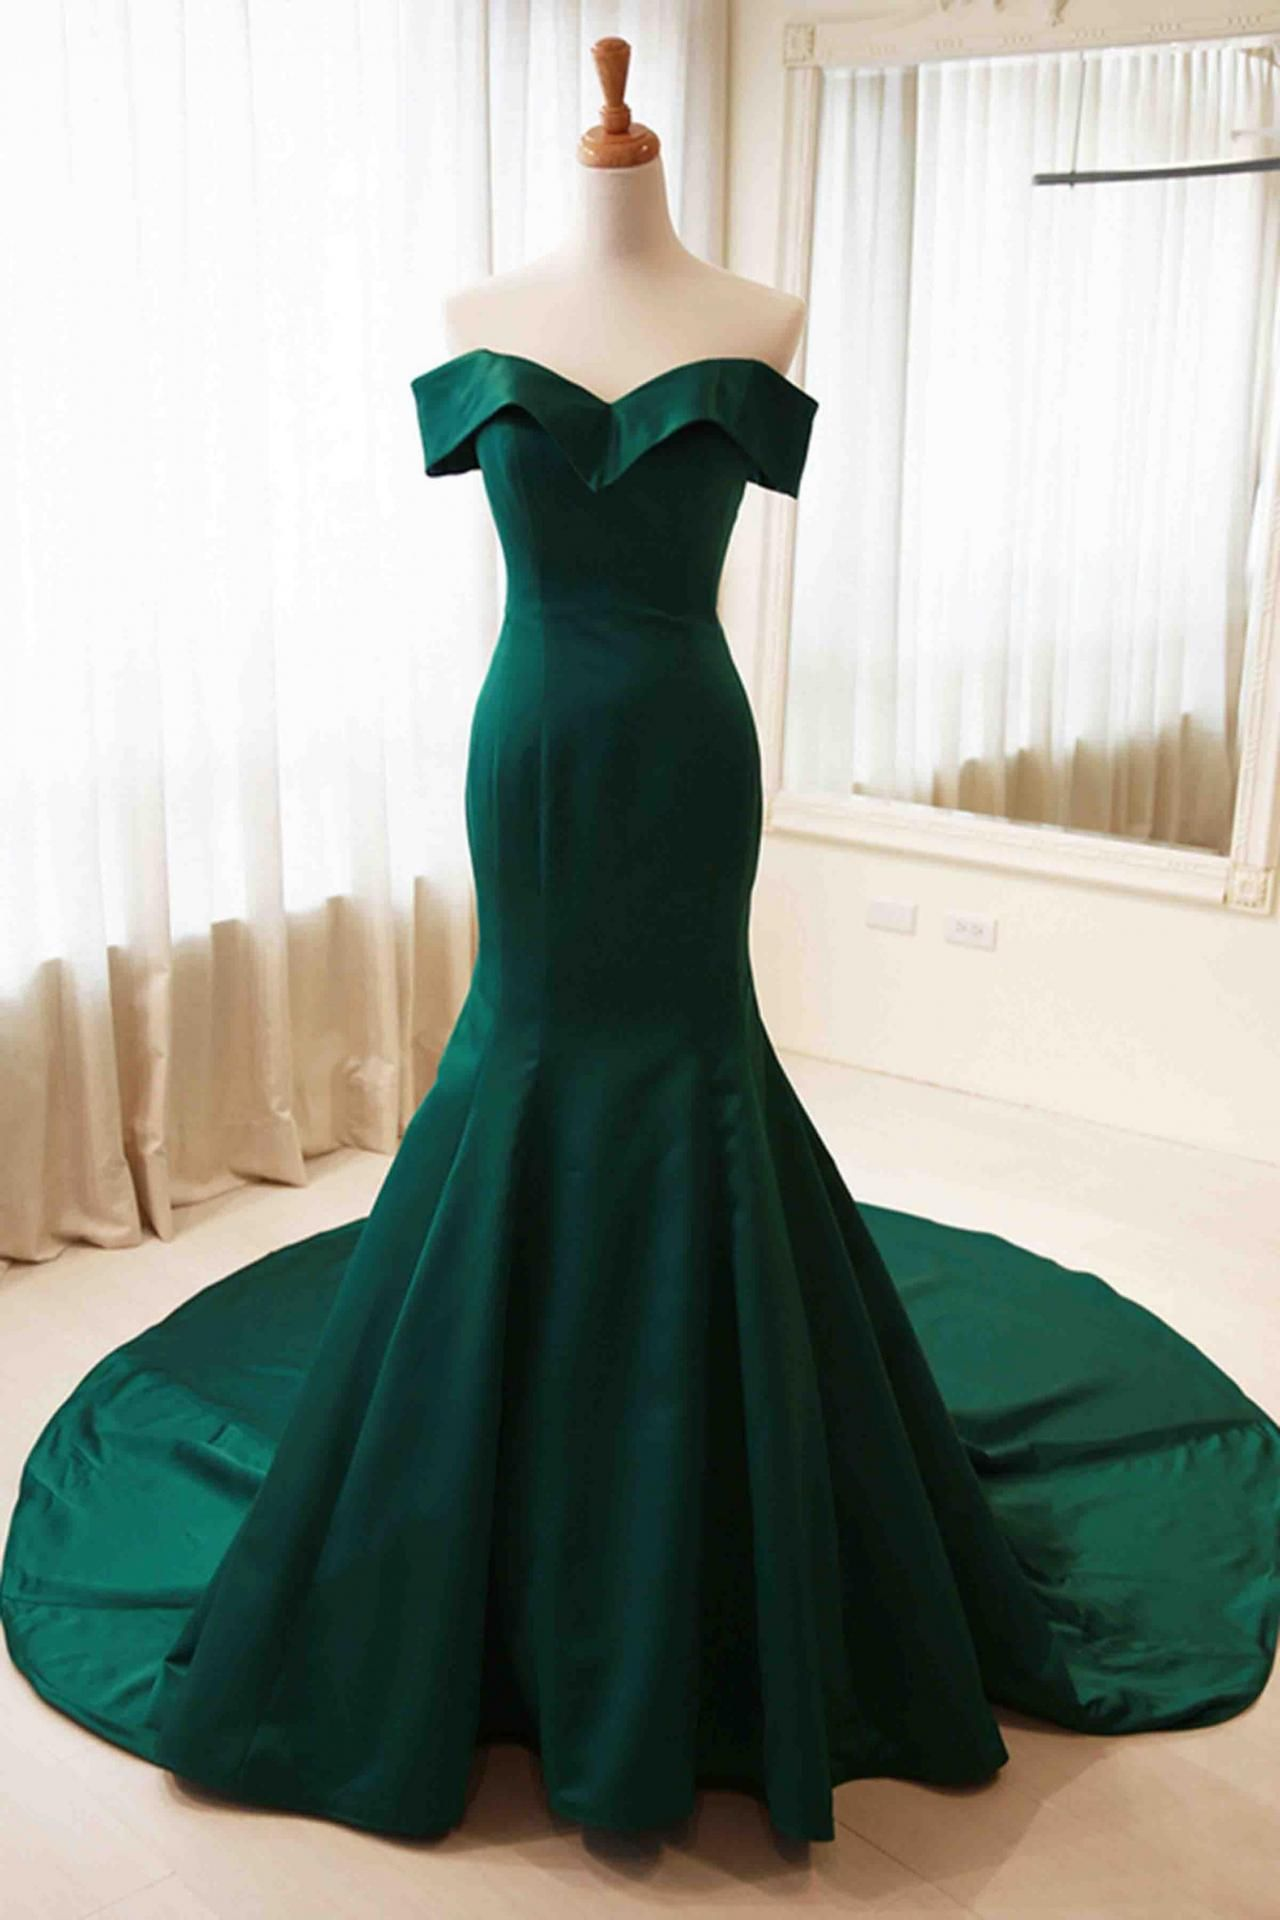 Elegant Green Off Shoulder Mermaid Long Prom Dress Sweep Train Formal Dresses Green Prom Dress Prom Dresses Long Mermaid Prom Dresses Long [ 1920 x 1280 Pixel ]